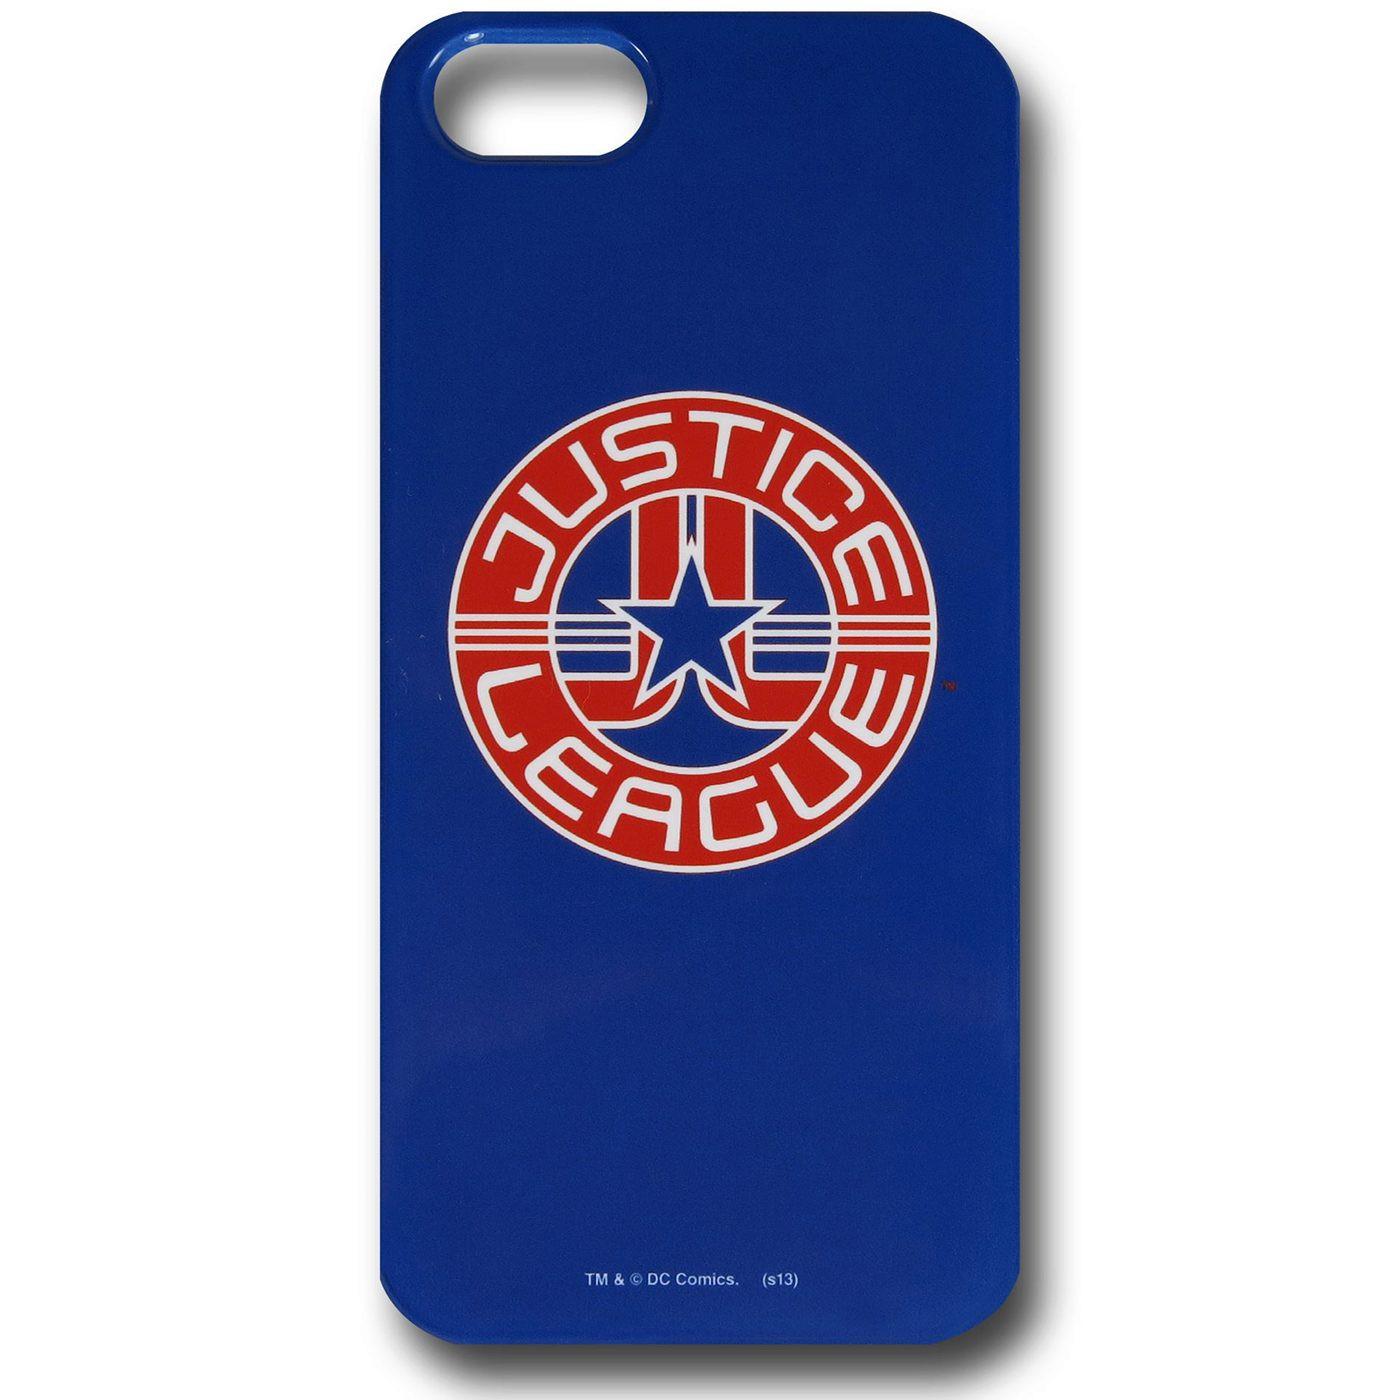 Justice League Logo iPhone 5 Snap Case